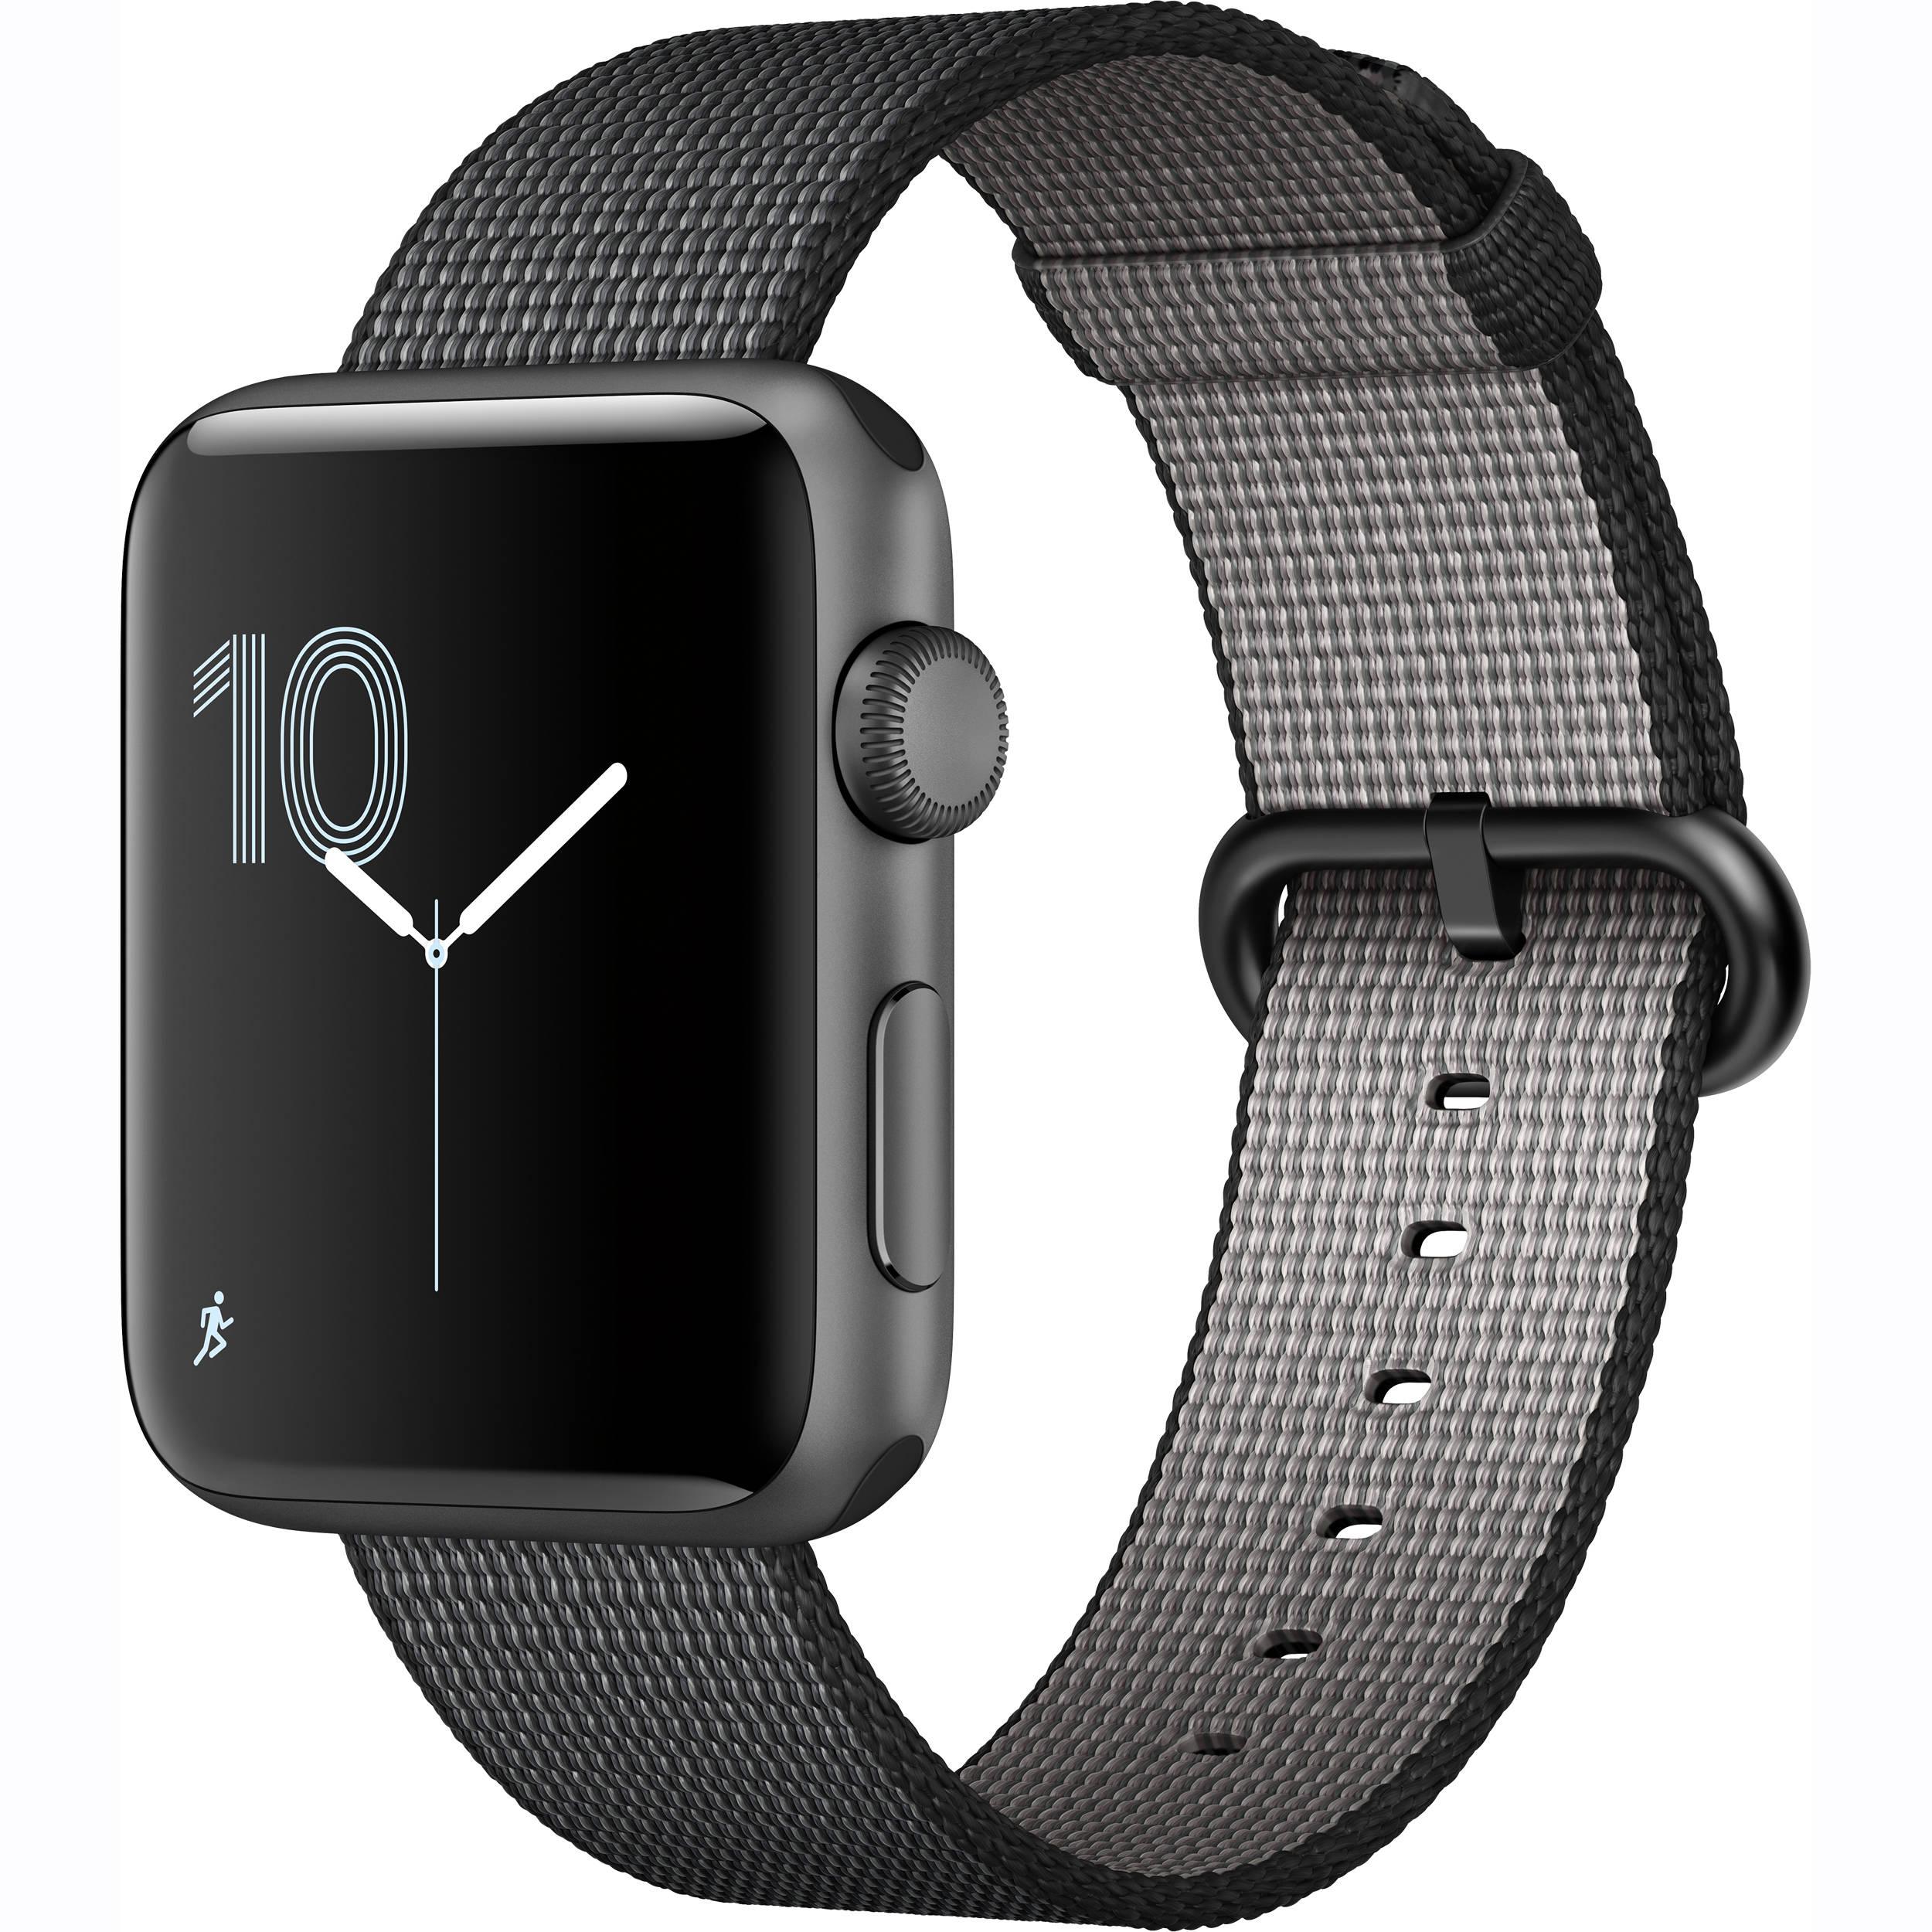 Apple Watch Series 2 42mm Smartwatch Mp072ll A B H Photo Video